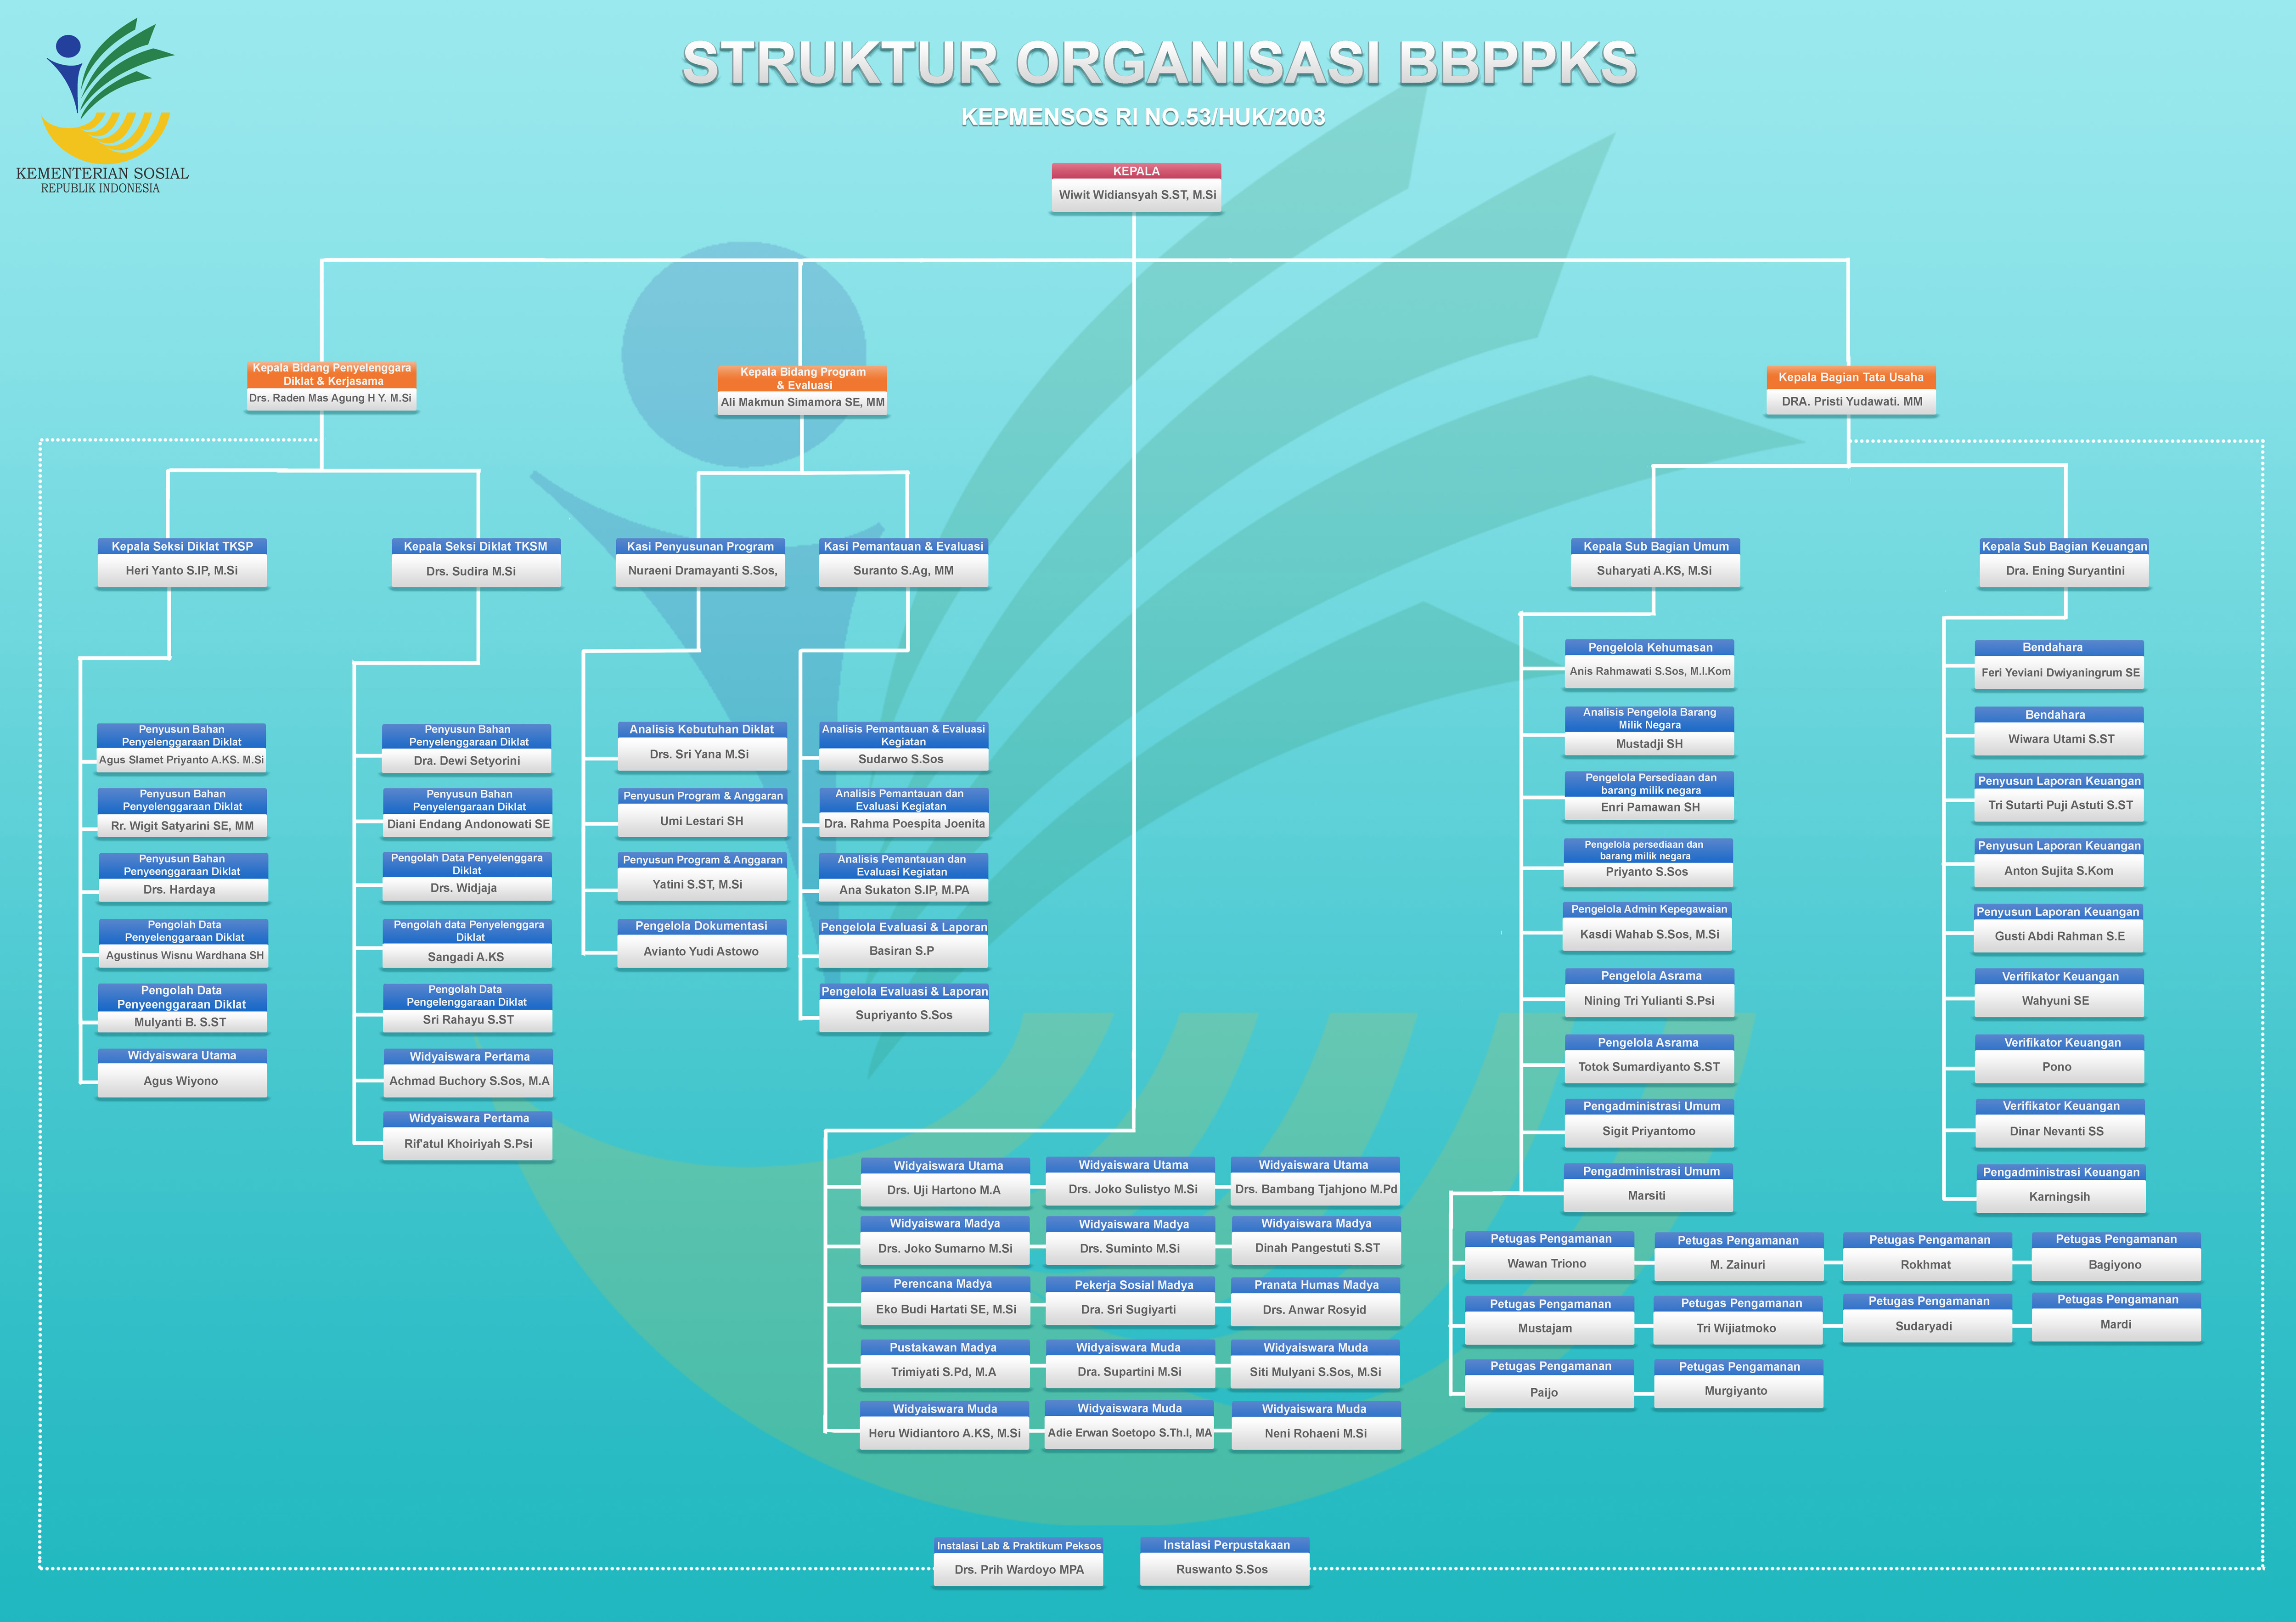 Struktur organisasi BBPPKS small